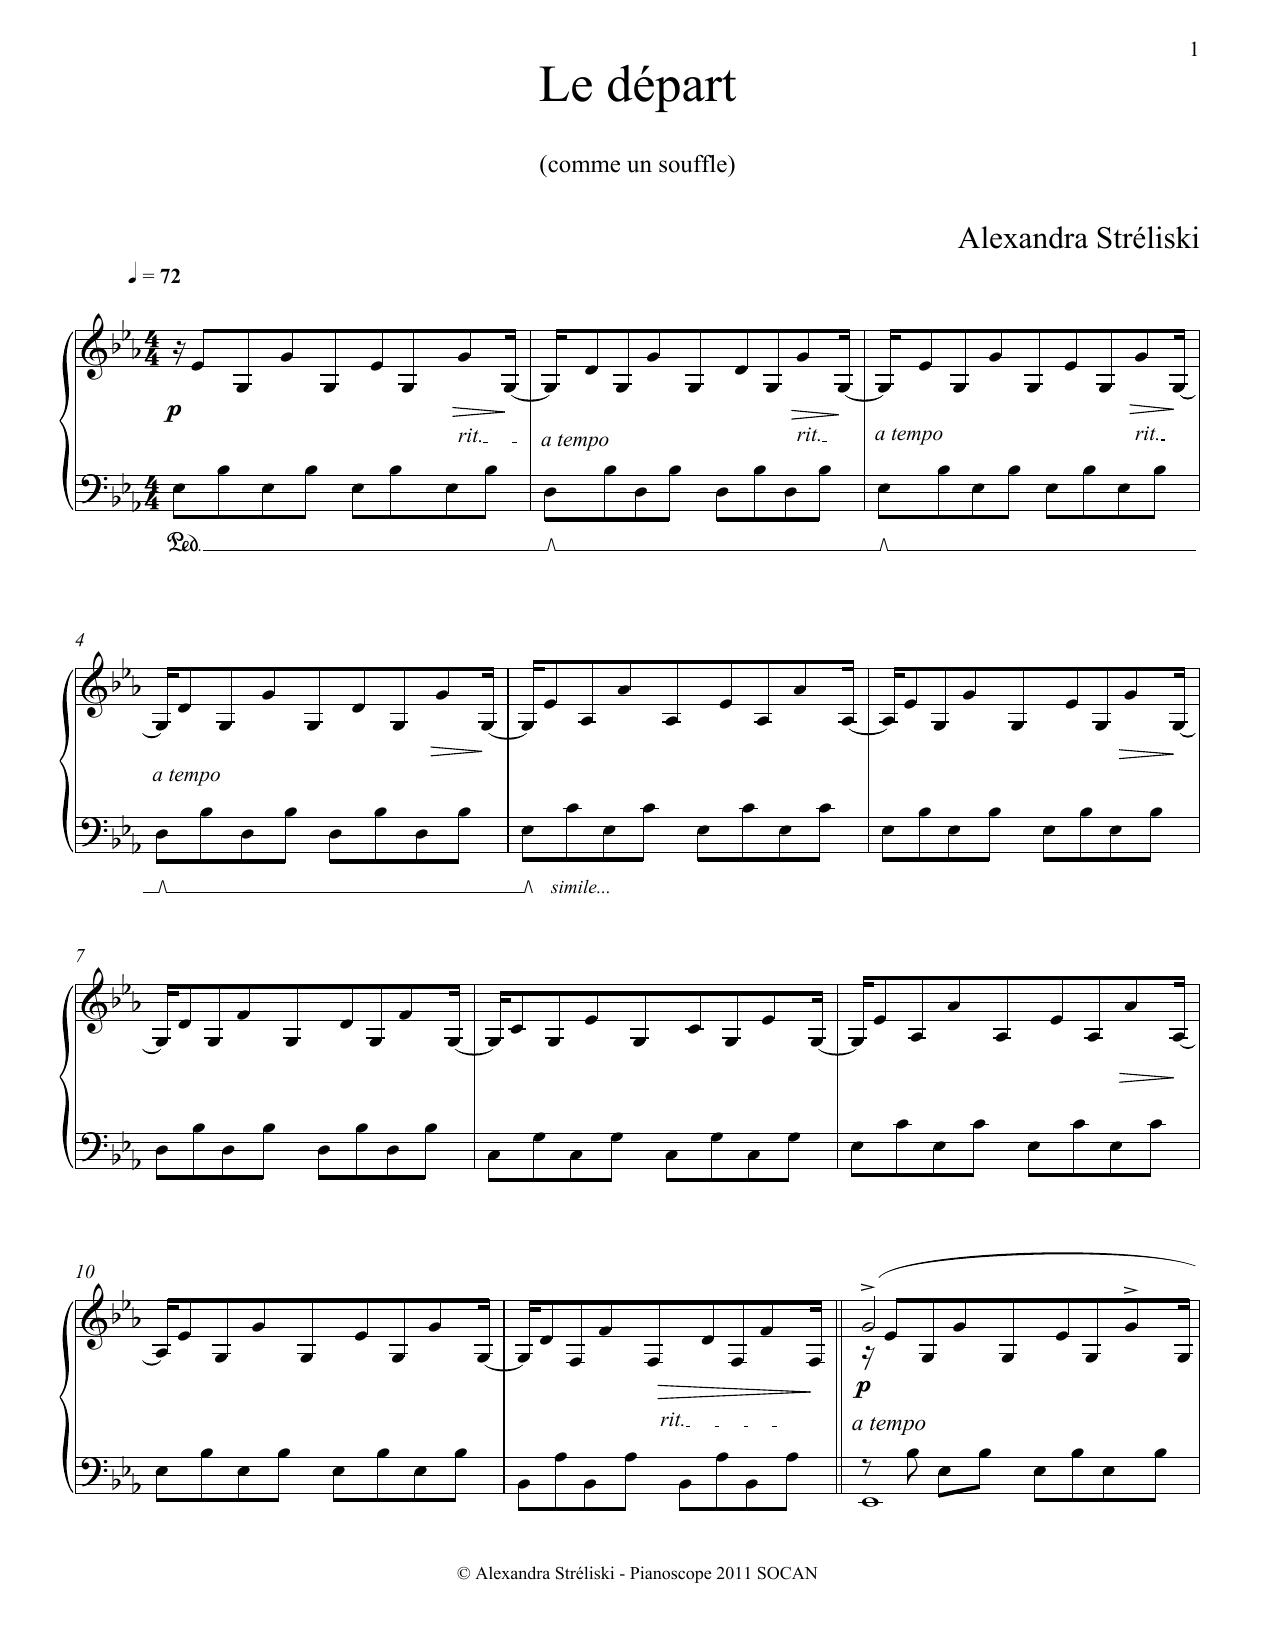 Le depart Sheet Music